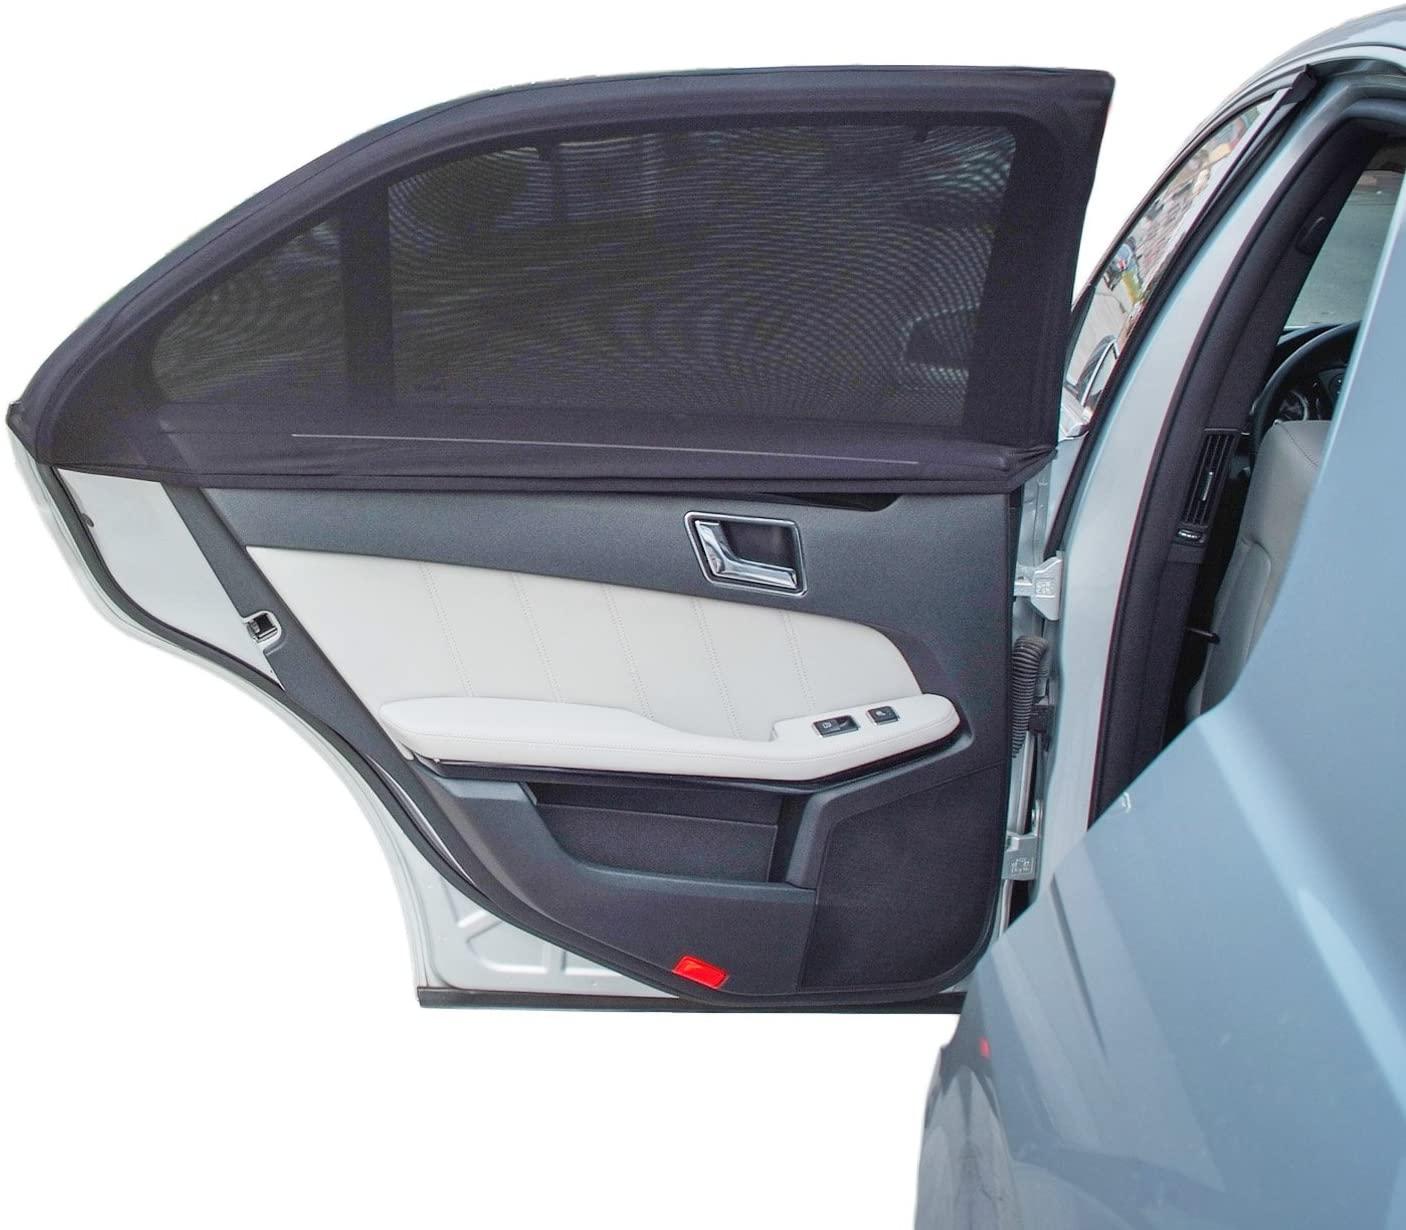 TFY Universal Best Baby Car Side Window Sun Shade